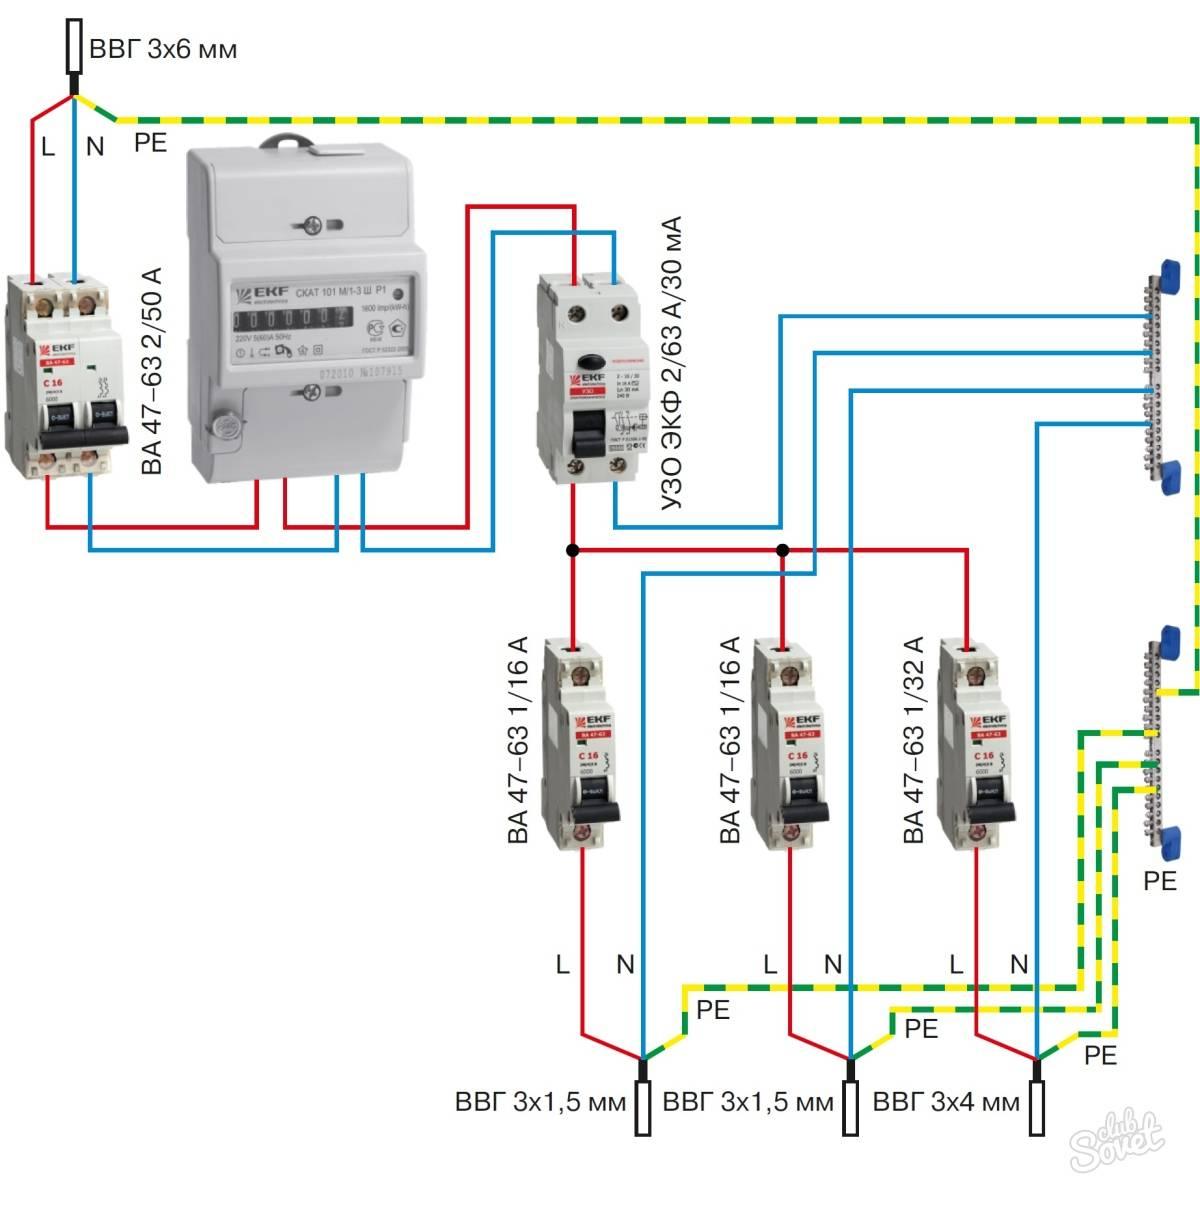 Без помощи профи: подключение дифавтомата просто и быстро